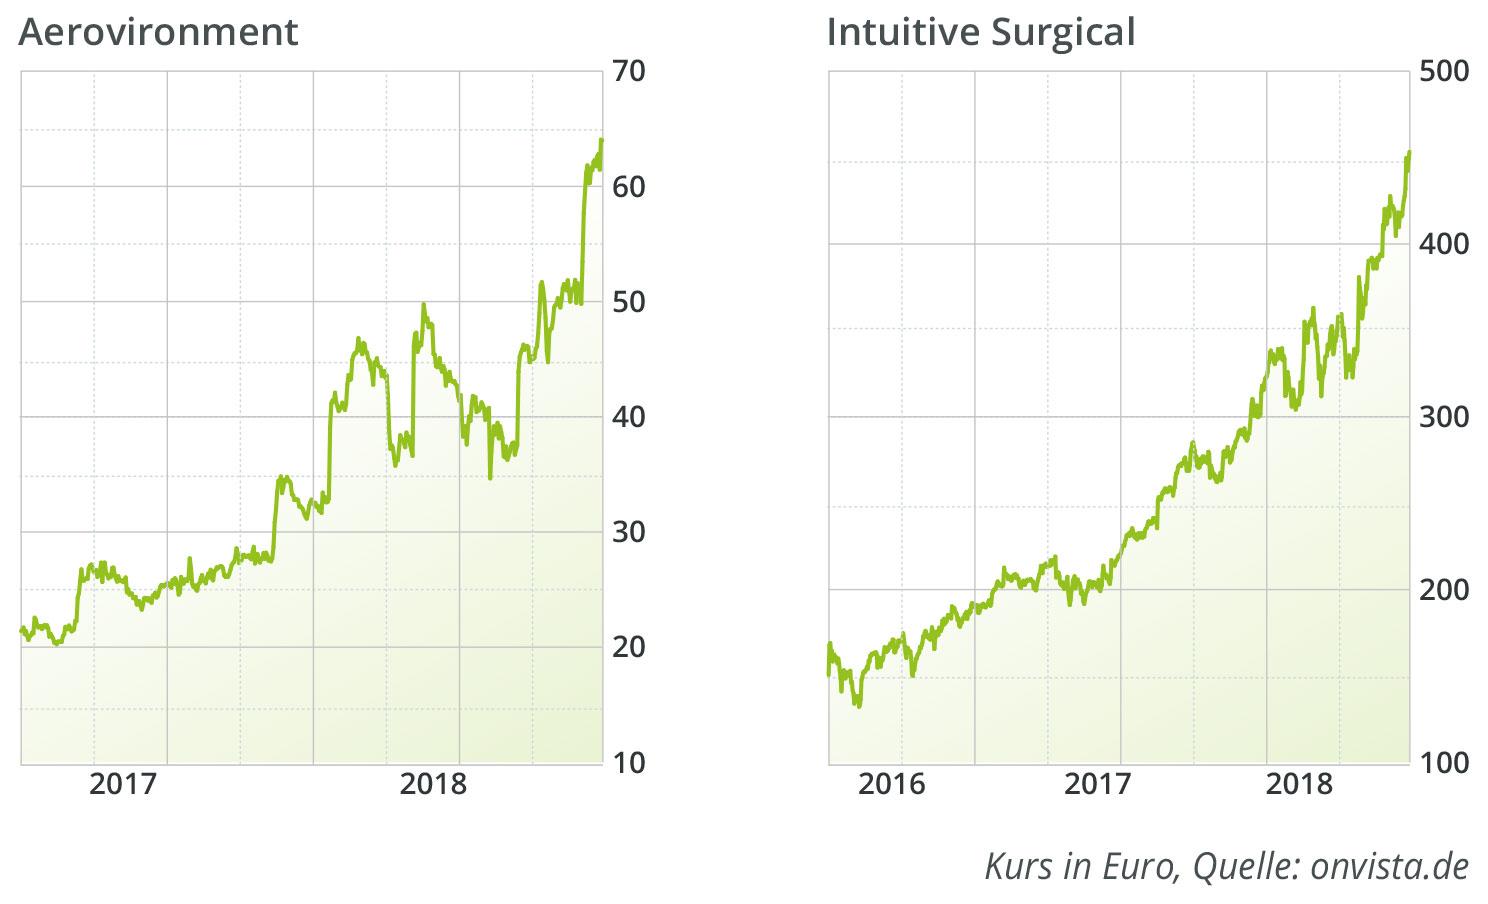 aerovironment-intuitive-surgical-aktie-kurs